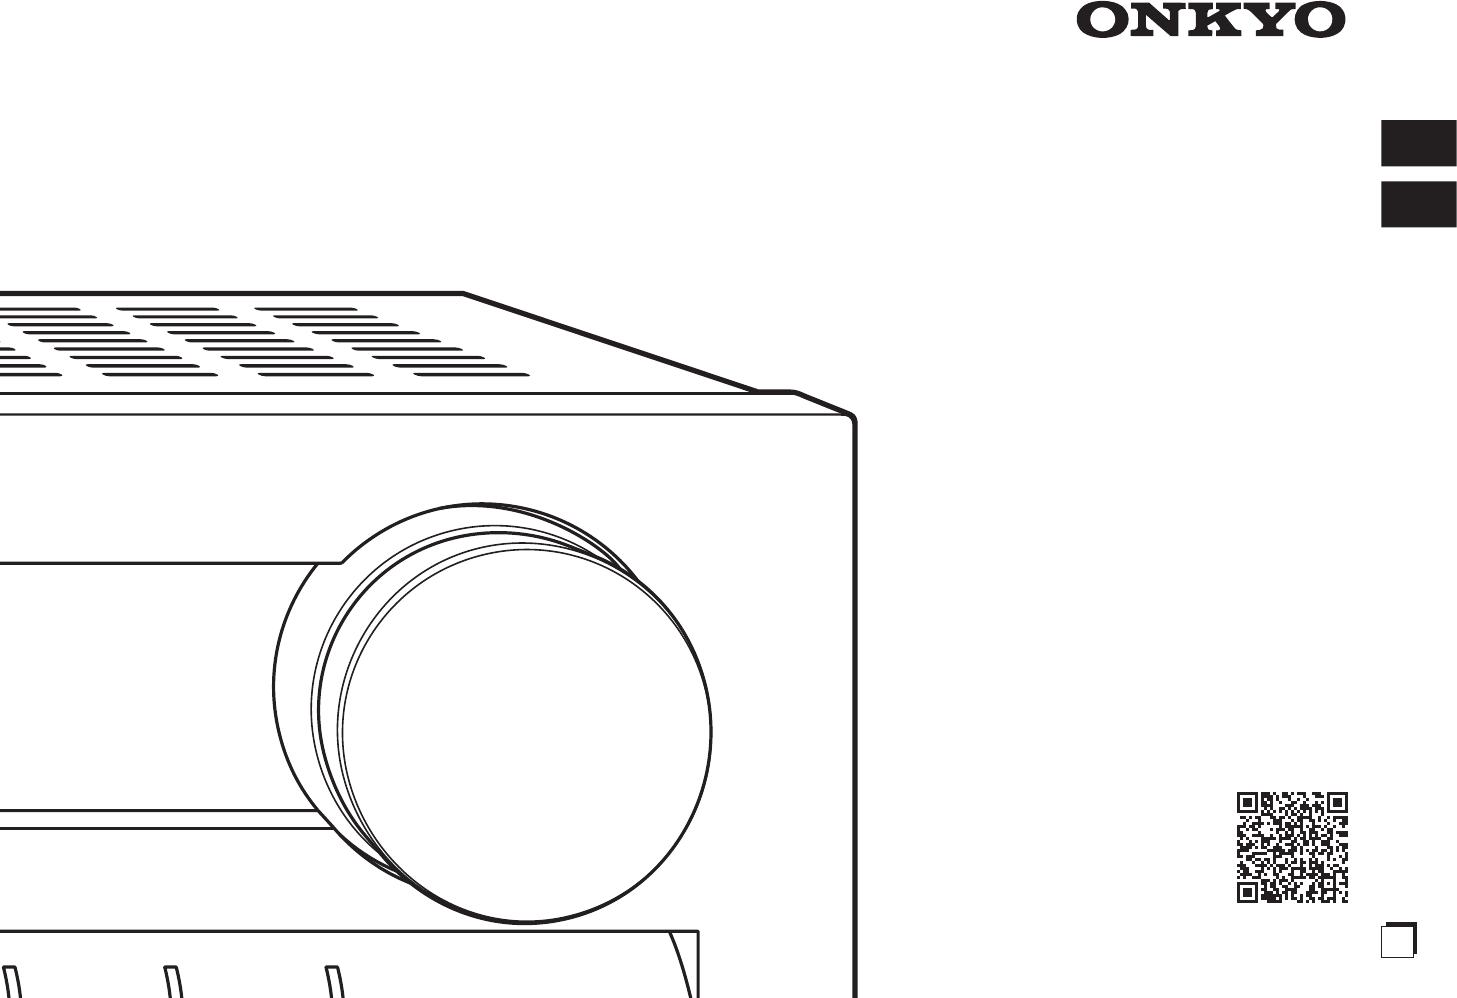 Handleiding Onkyo TX-NR3030 (pagina 1 van 48) (Espanõl